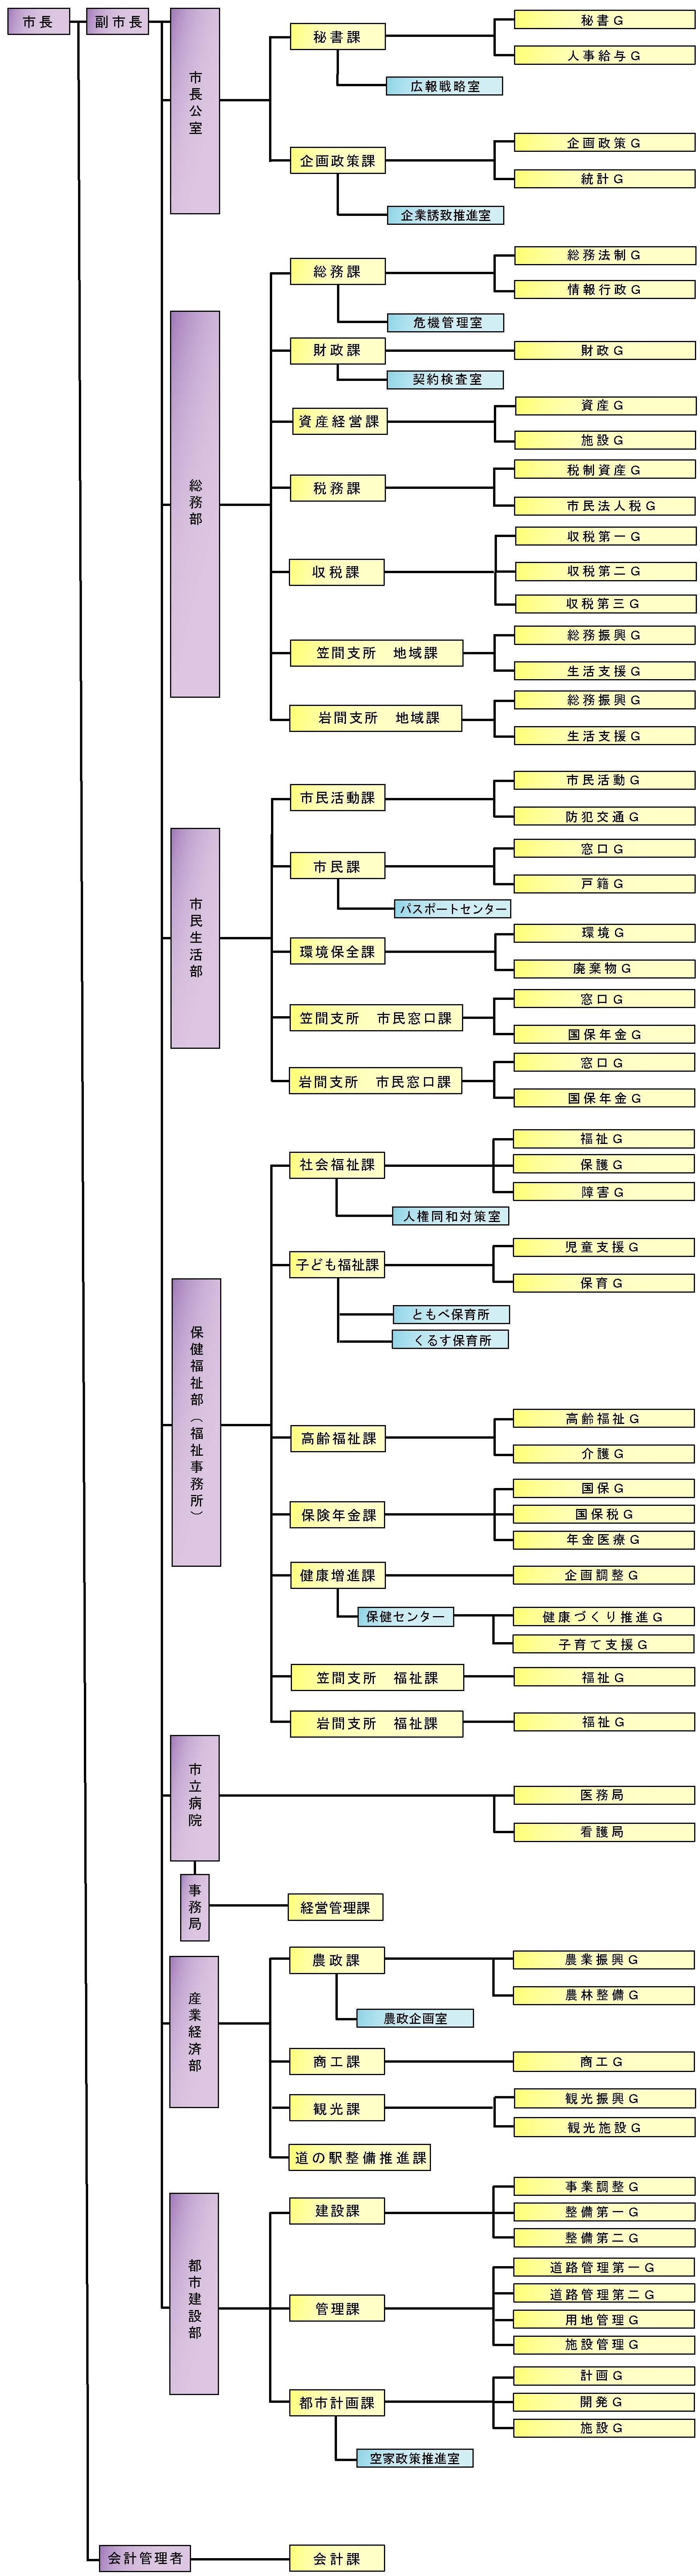 『H31 本庁組織図』の画像